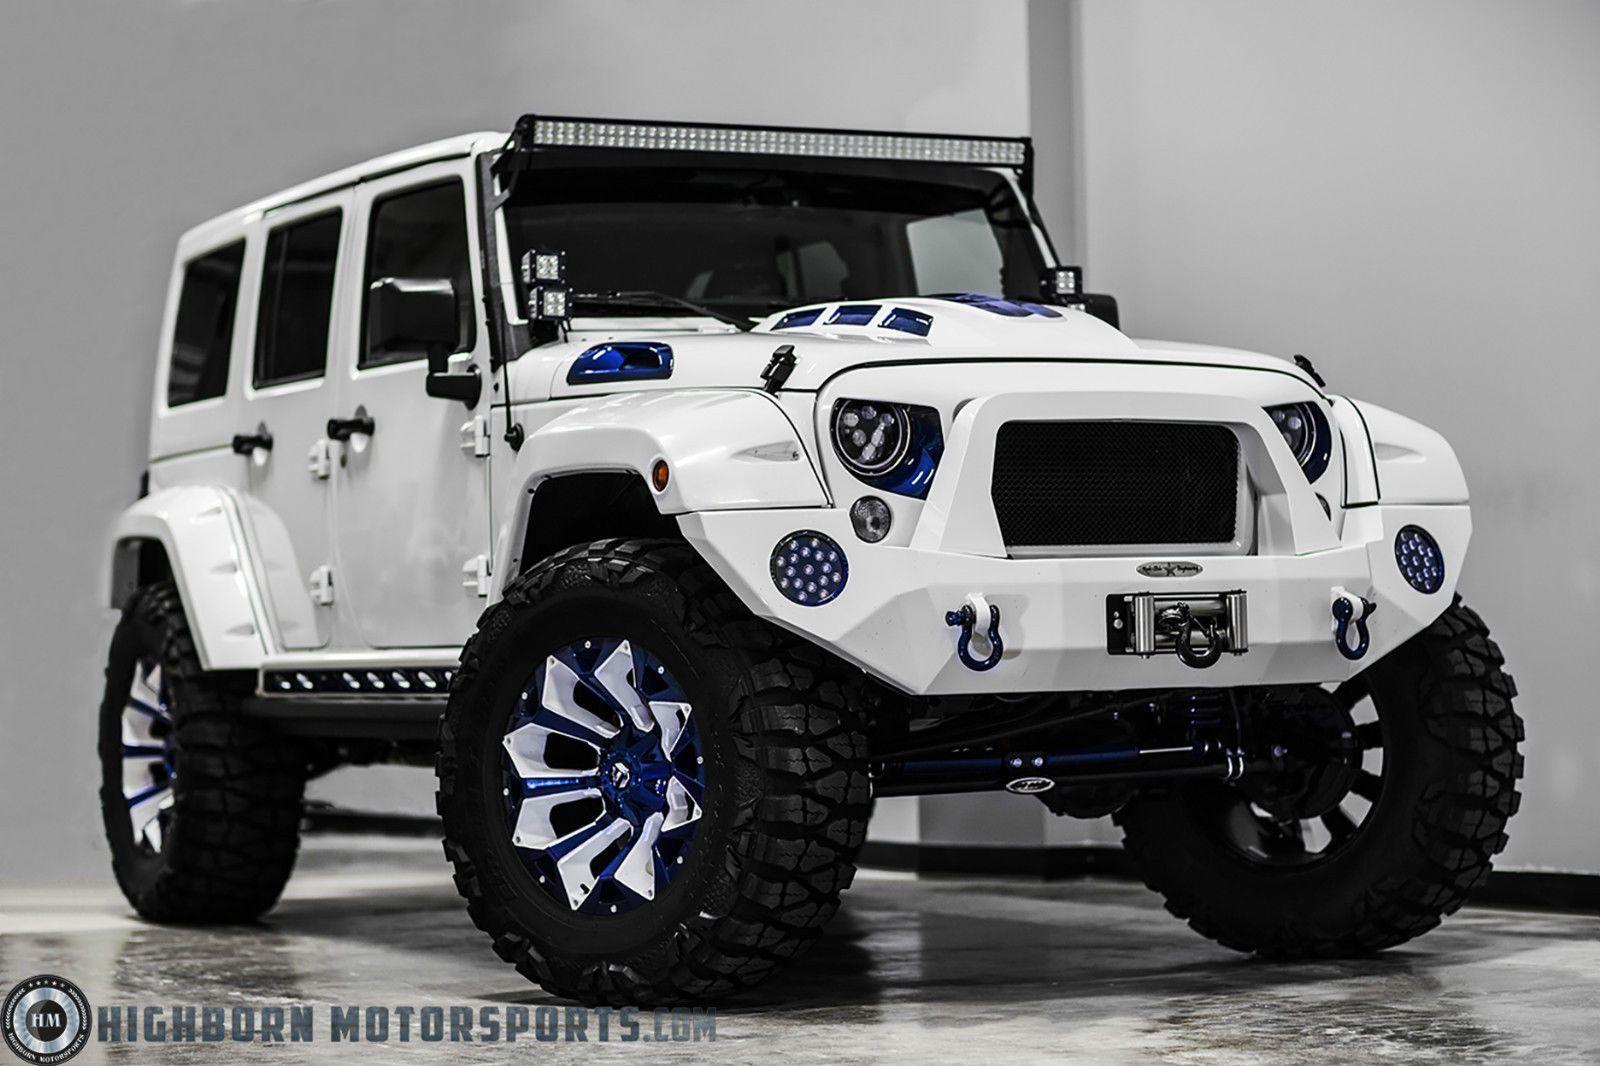 Novosti Jeep Wrangler Sport Unlimited Jeep Wrangler Sport Custom Jeep Wrangler